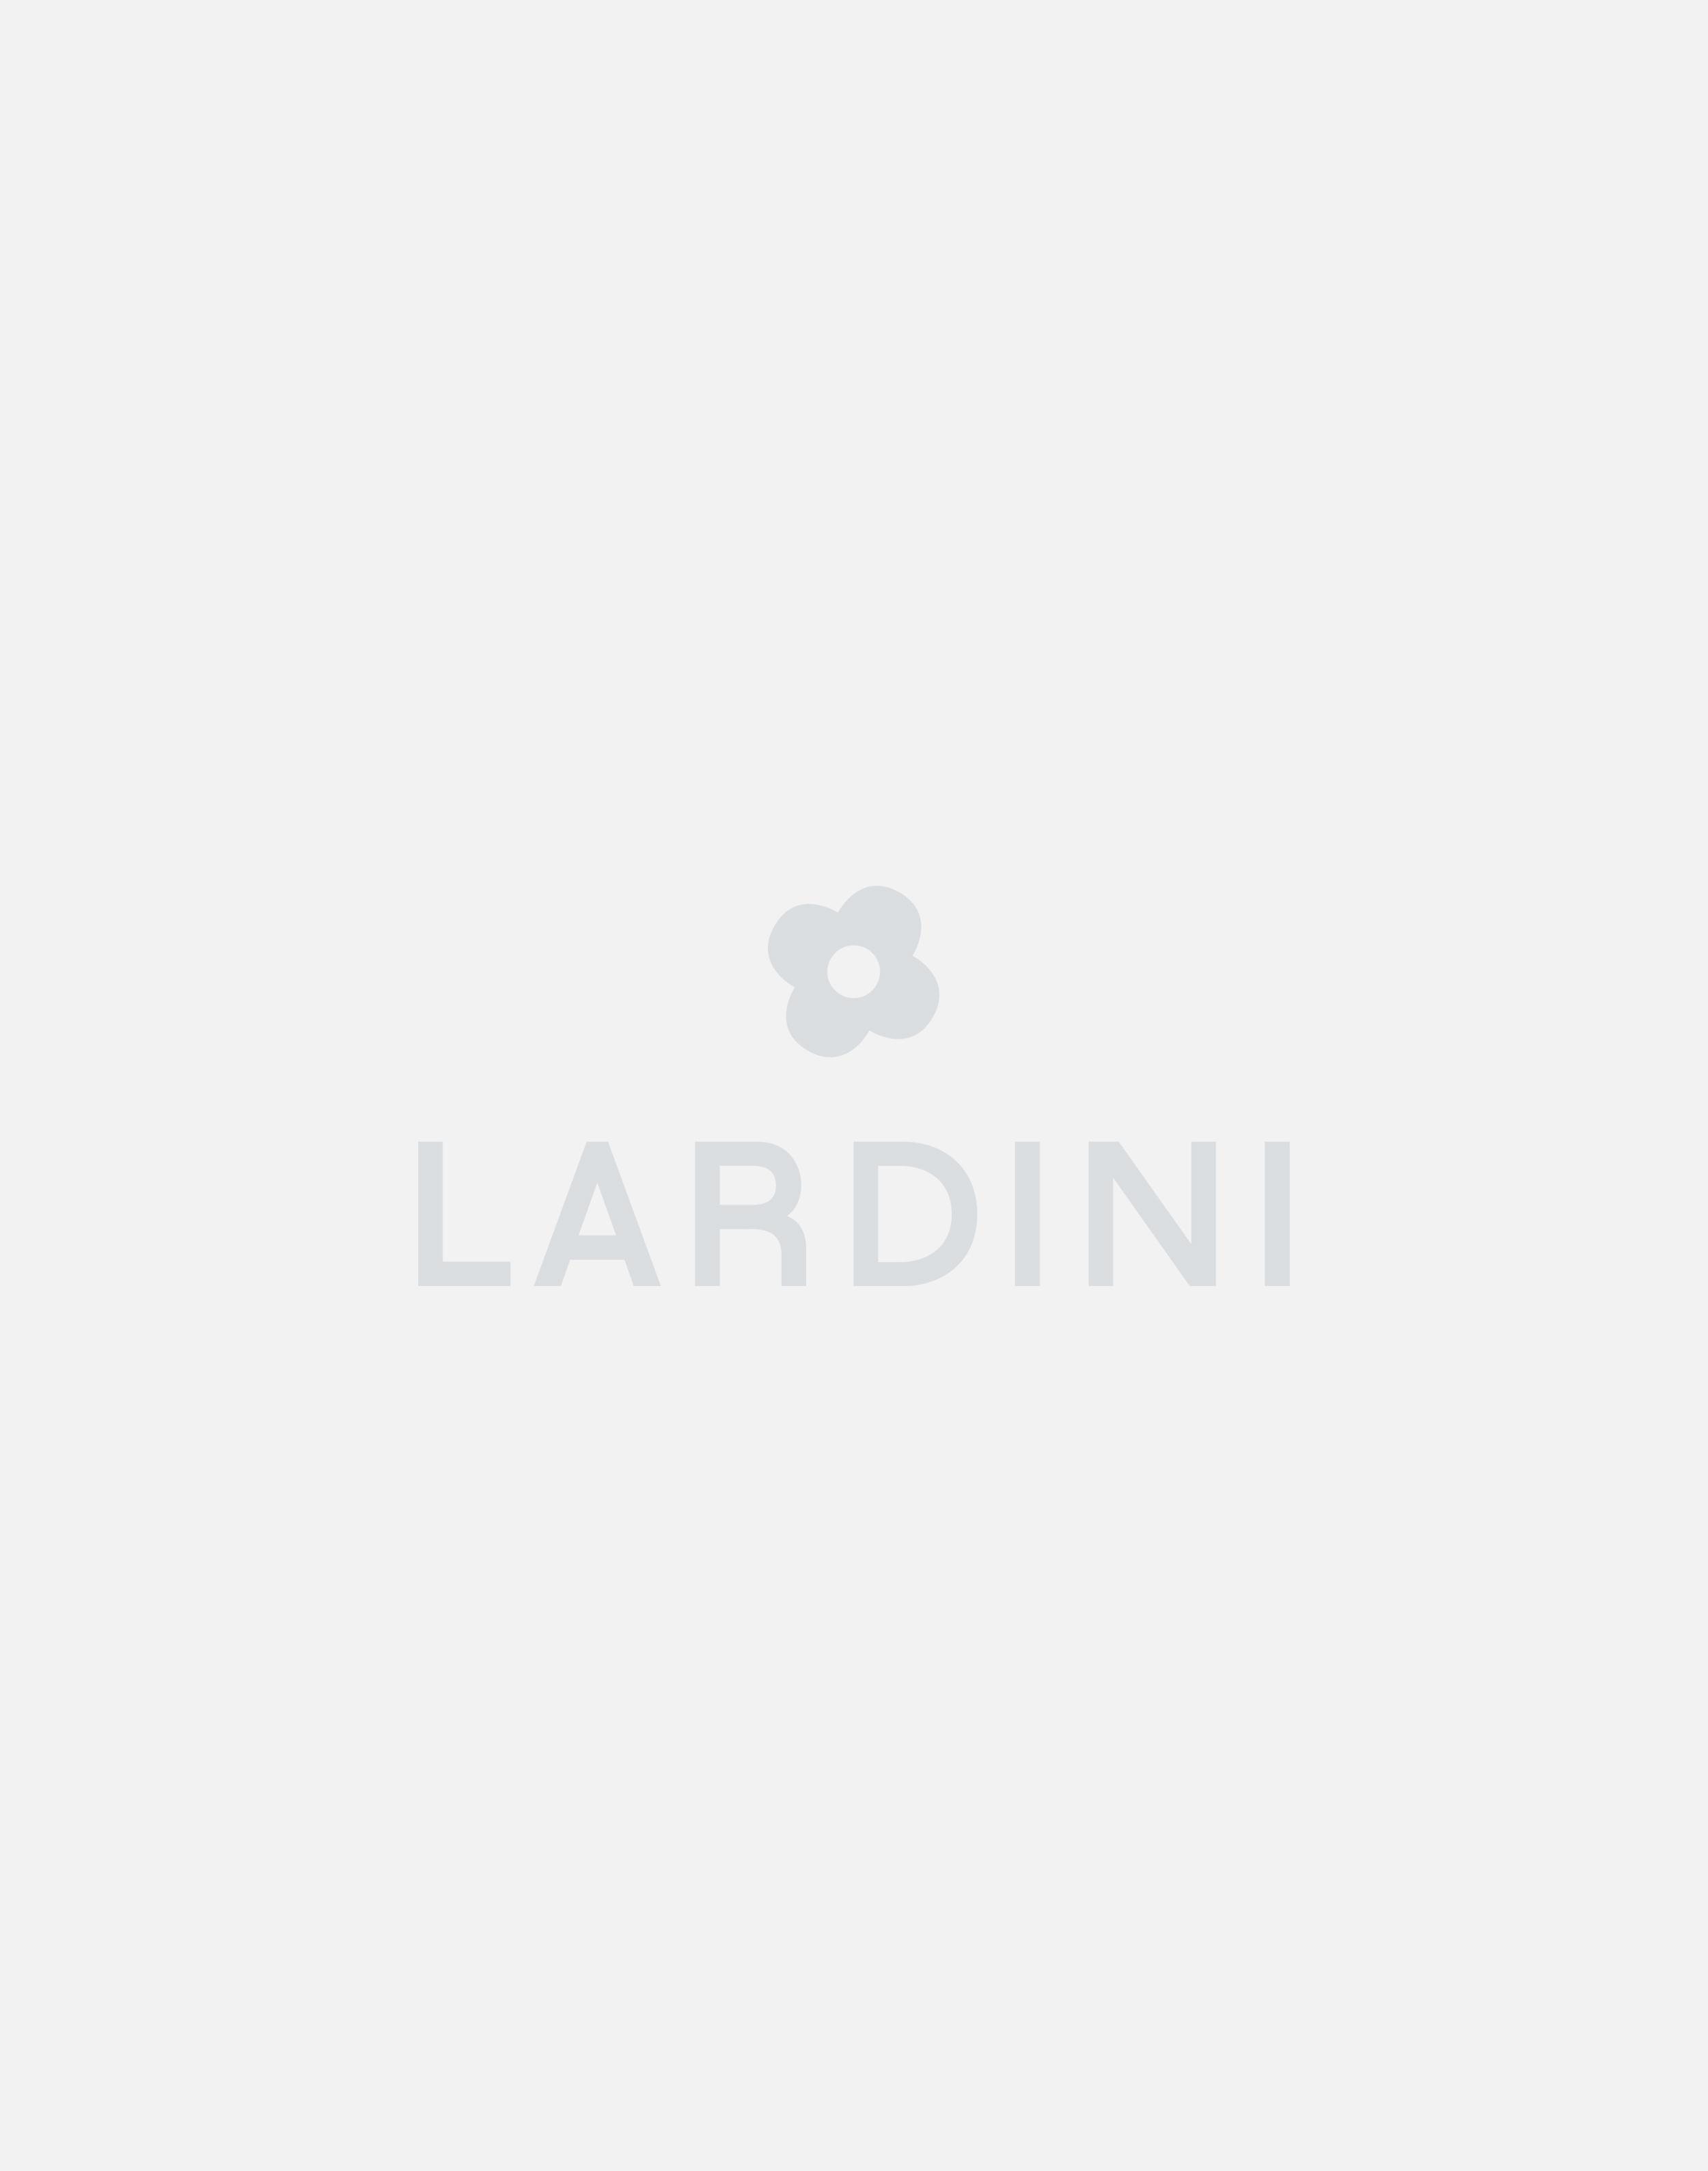 Grey cotton polo shirt - Luigi Lardini capsule